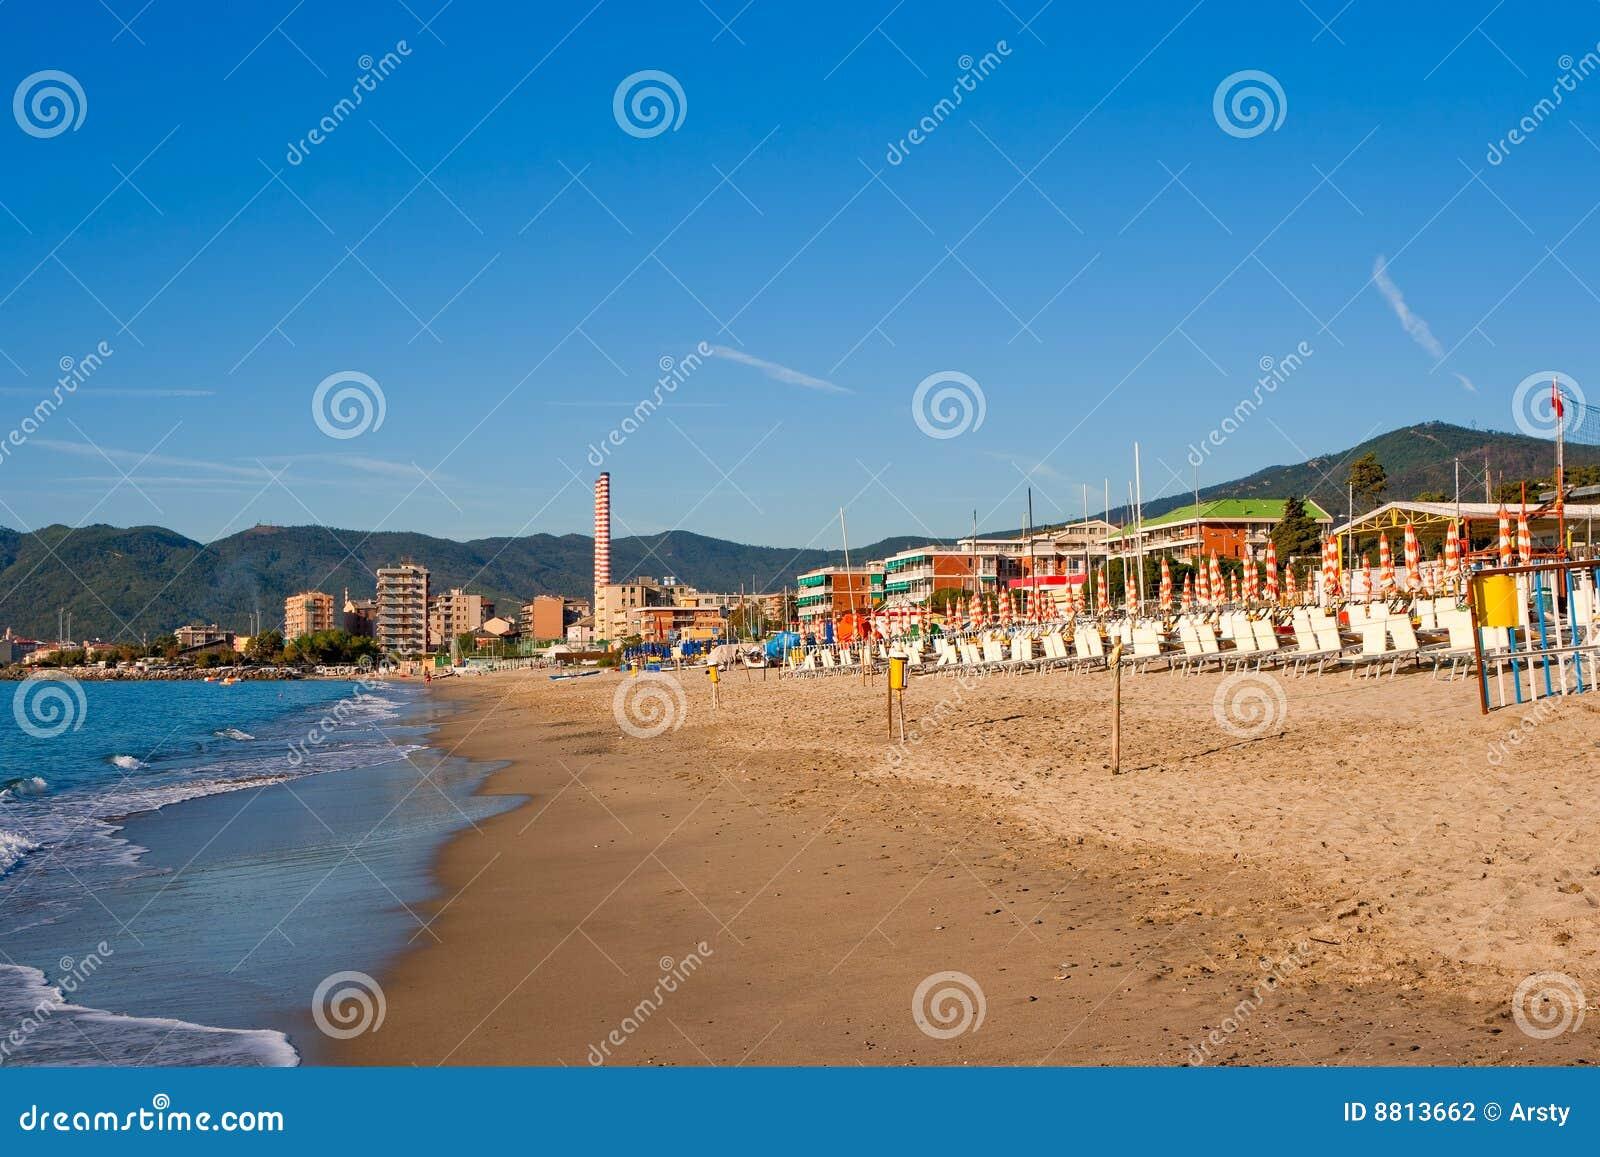 Beach in Savona. Italy